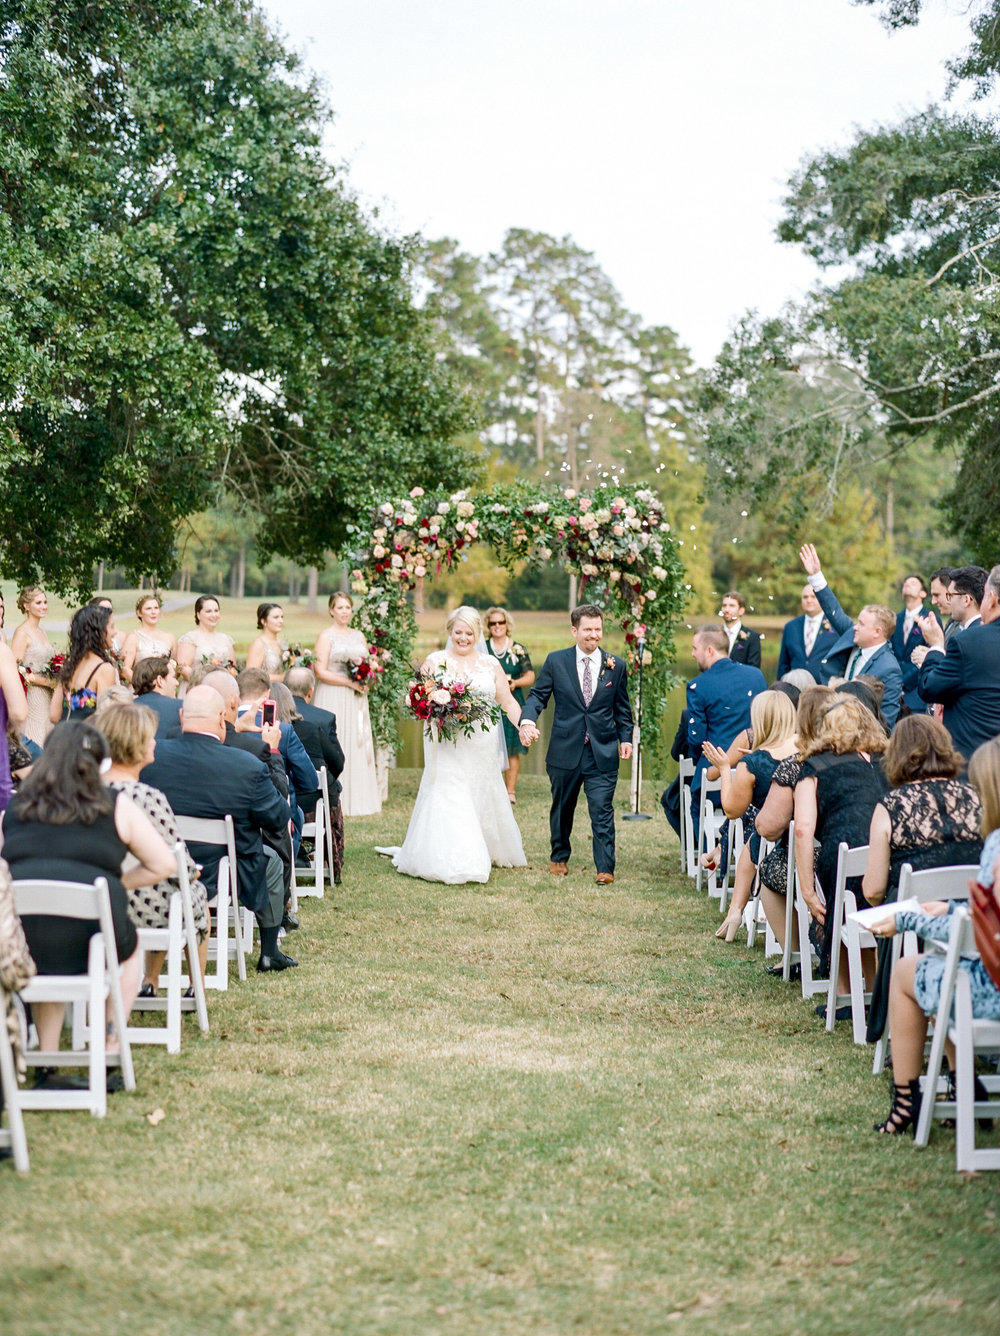 Houston-Wedding-Photographer-Fine-Art-Film-Destination-Style-Me-Pretty-Austin-Dallas-New-Orleans-Dana-Fernandez-Photography-The Woodlands-Country-Club-22.jpg